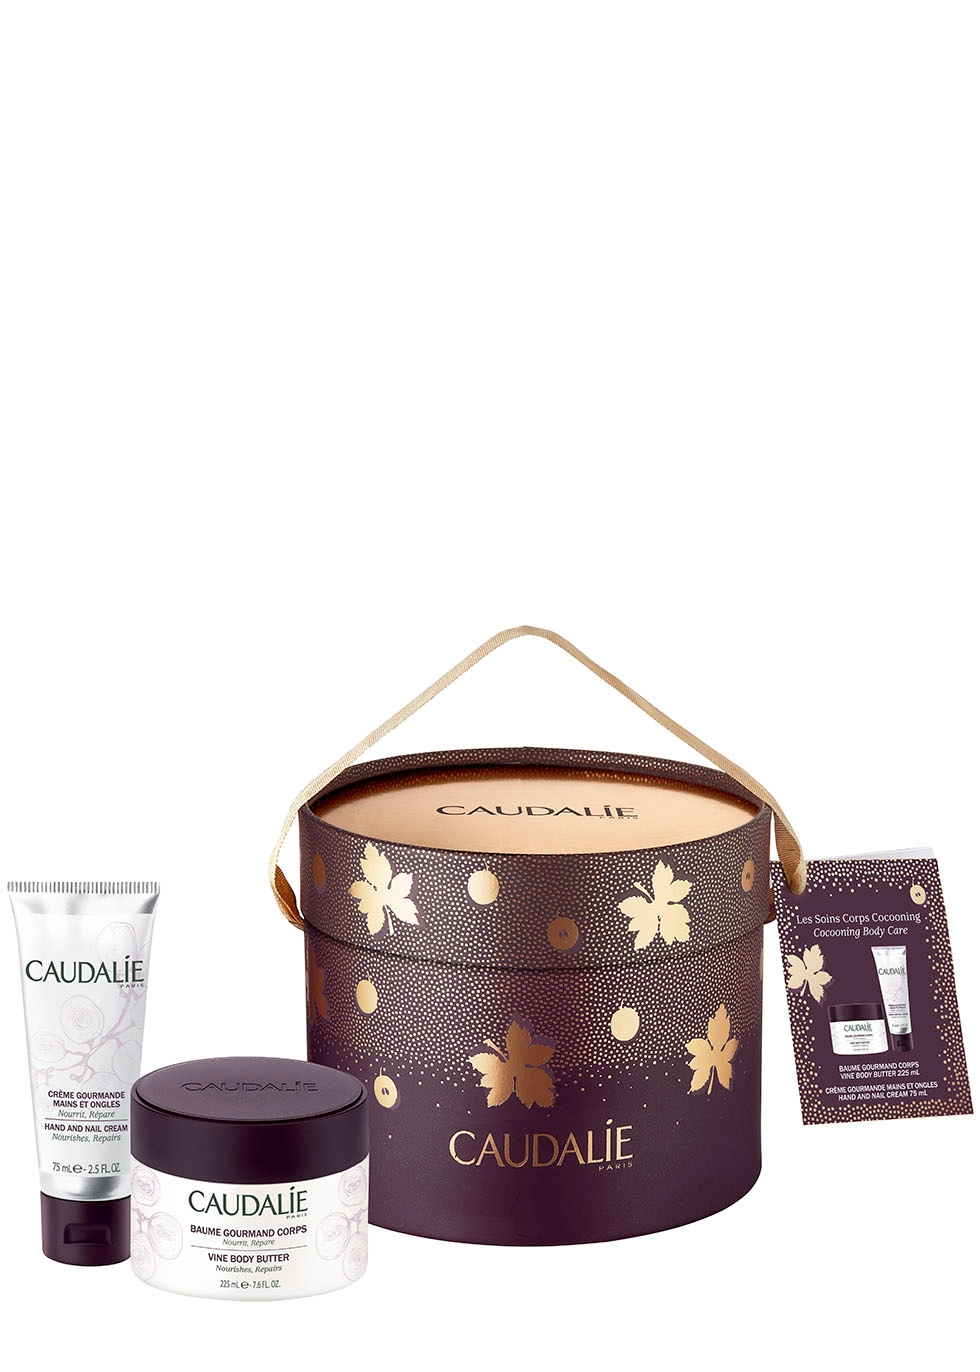 Vine Body Butter Gift Set - CAUDALIE